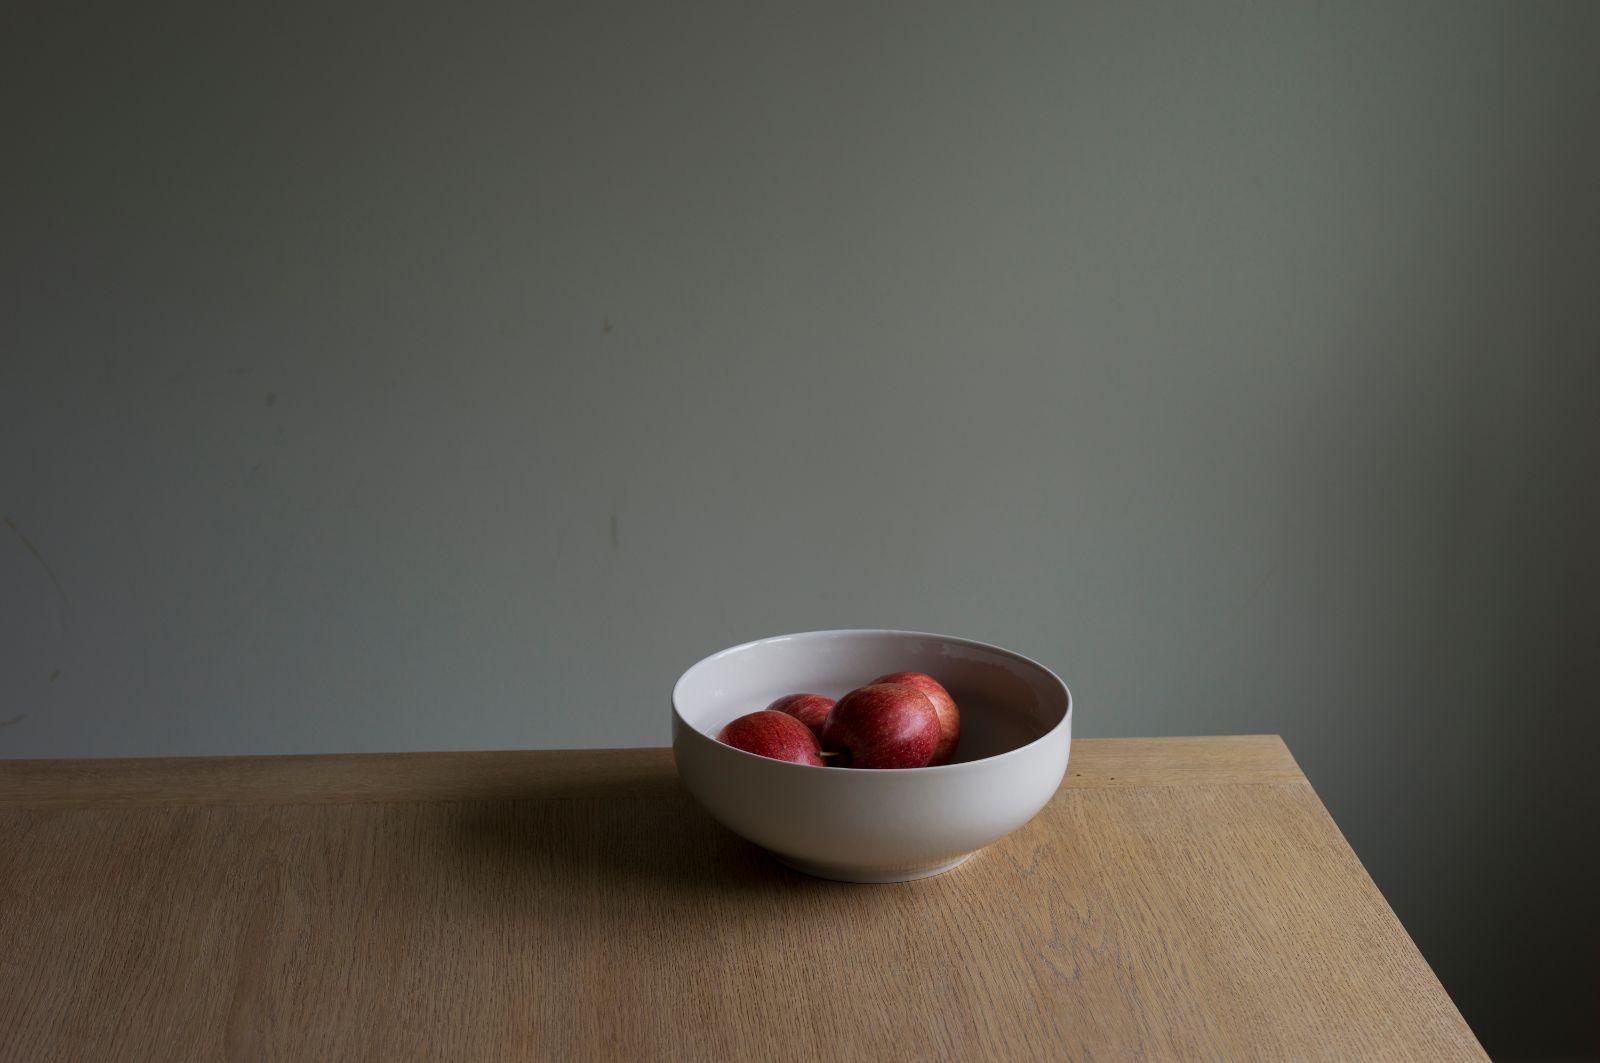 your table, my apples, 2016, archival inkjet print, 78 x 117 cm, ed. 5 + AP